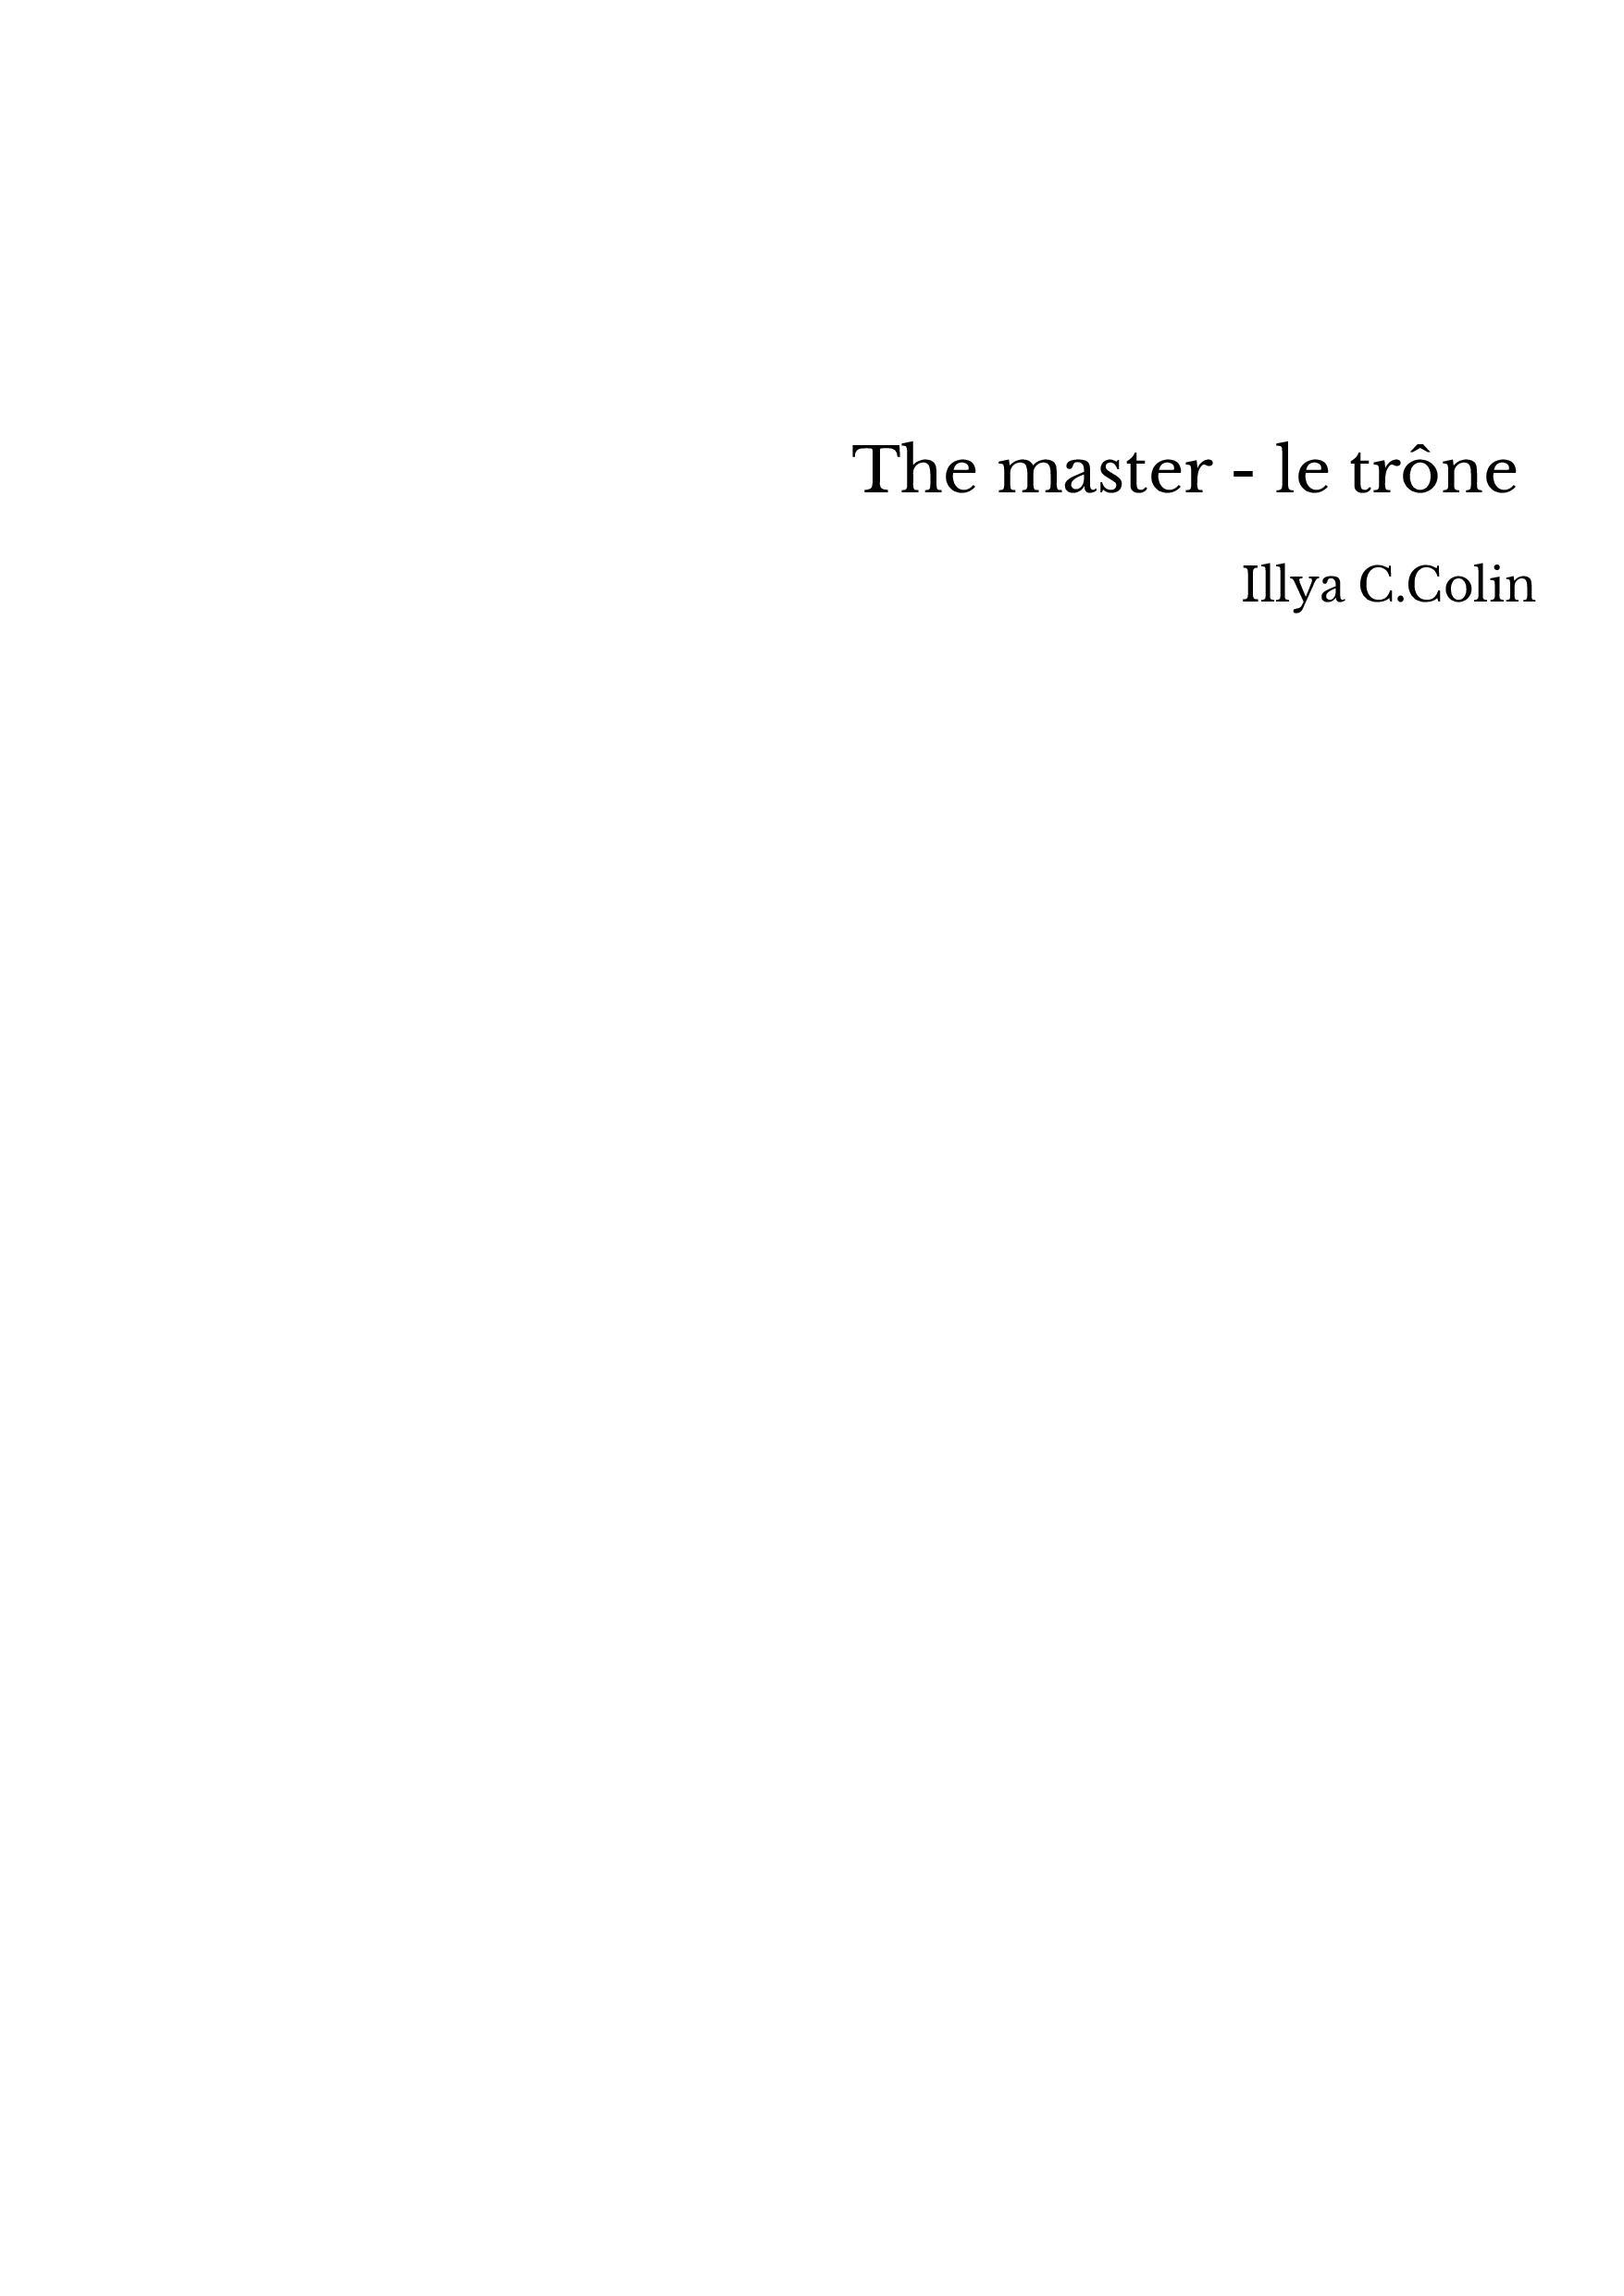 The master - le trône